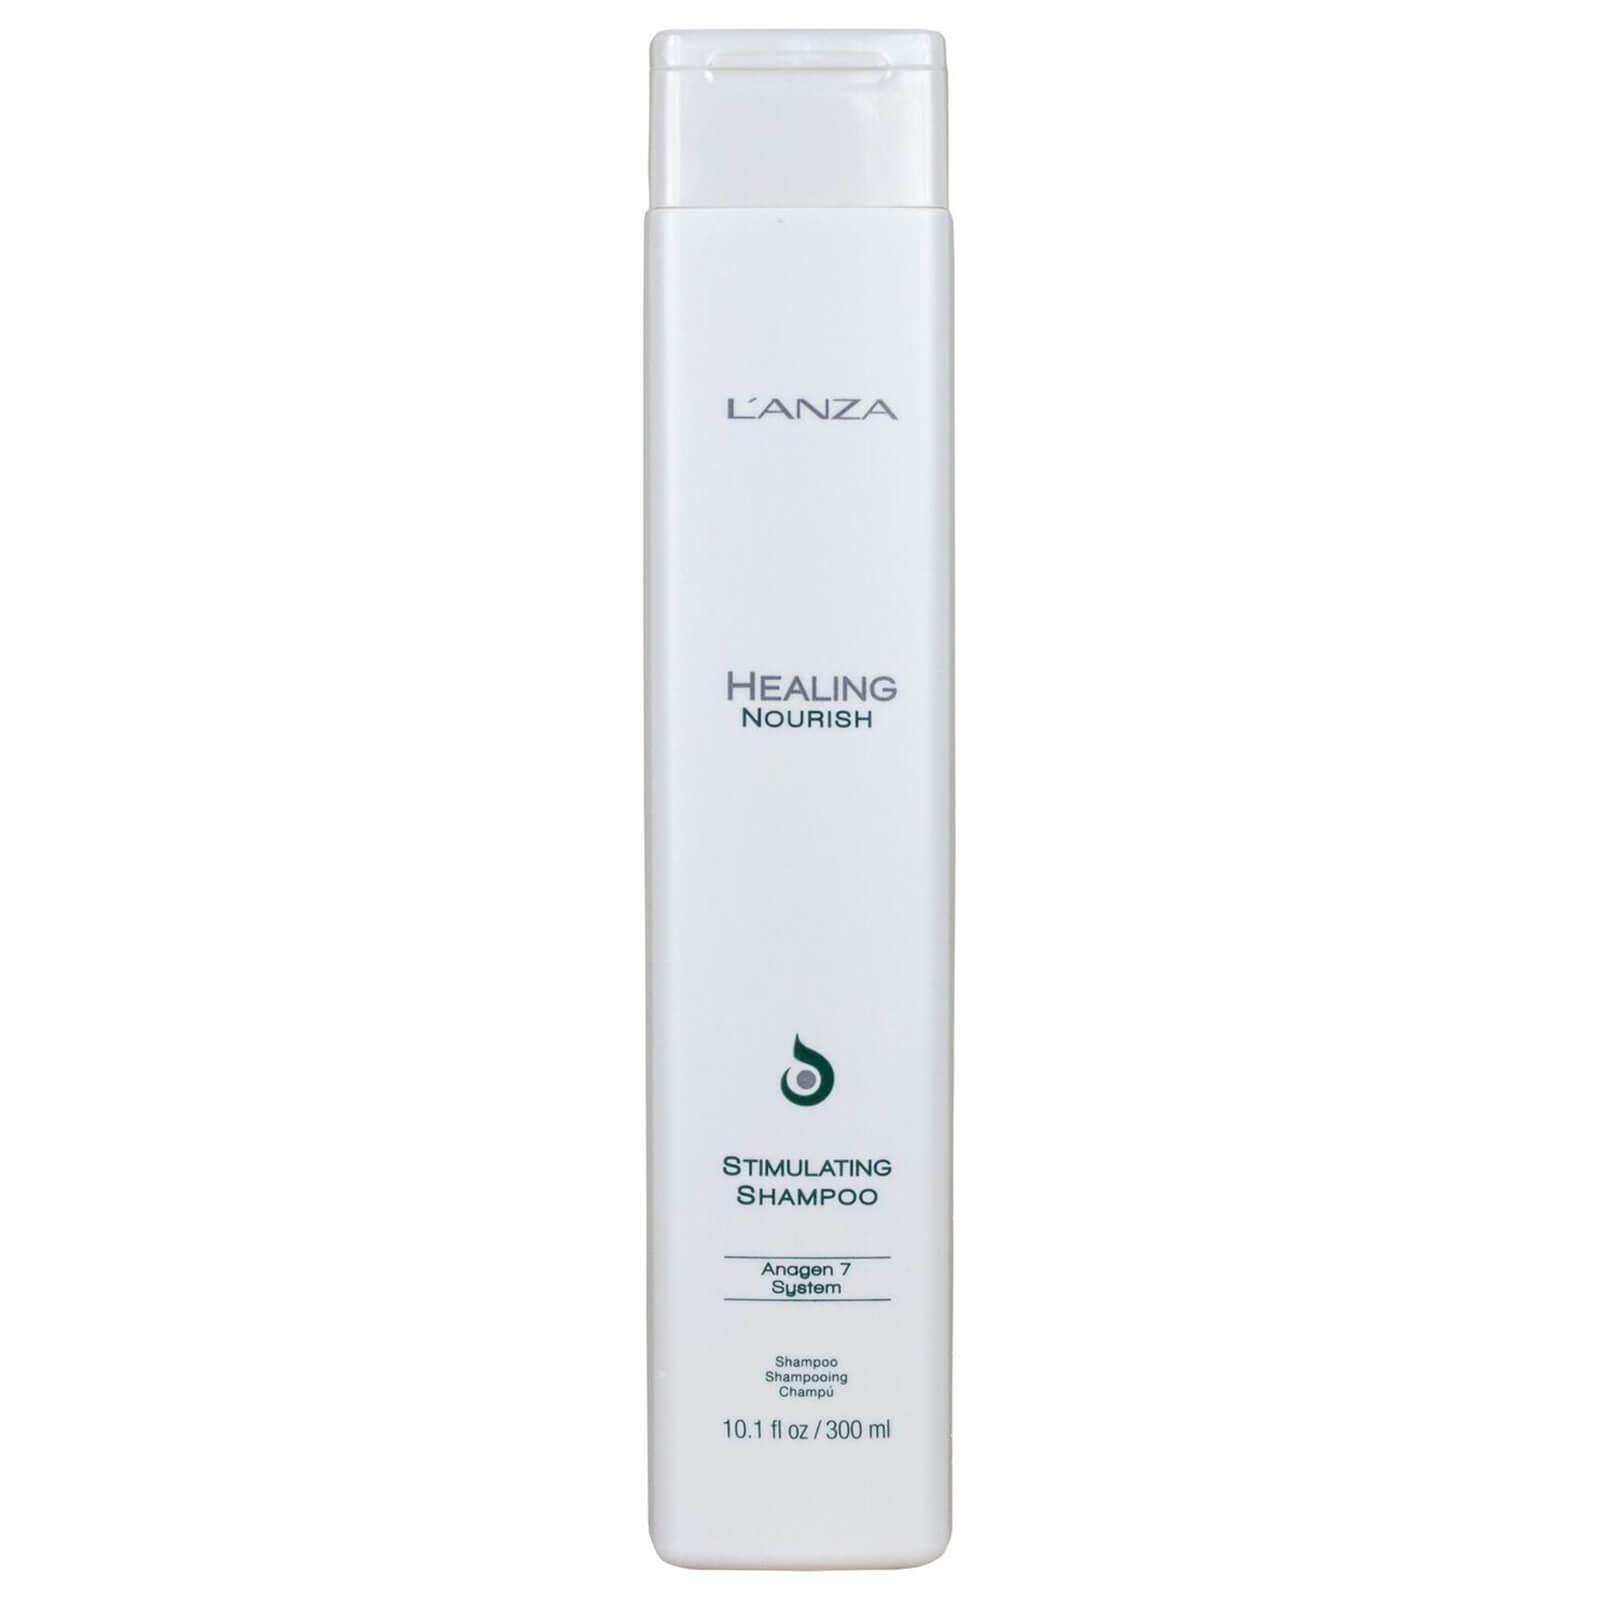 ШАМПОАН ПРОТИВ КОСОПАД LANZA HEALING NOURISH Stimulating Shampoo 300ML